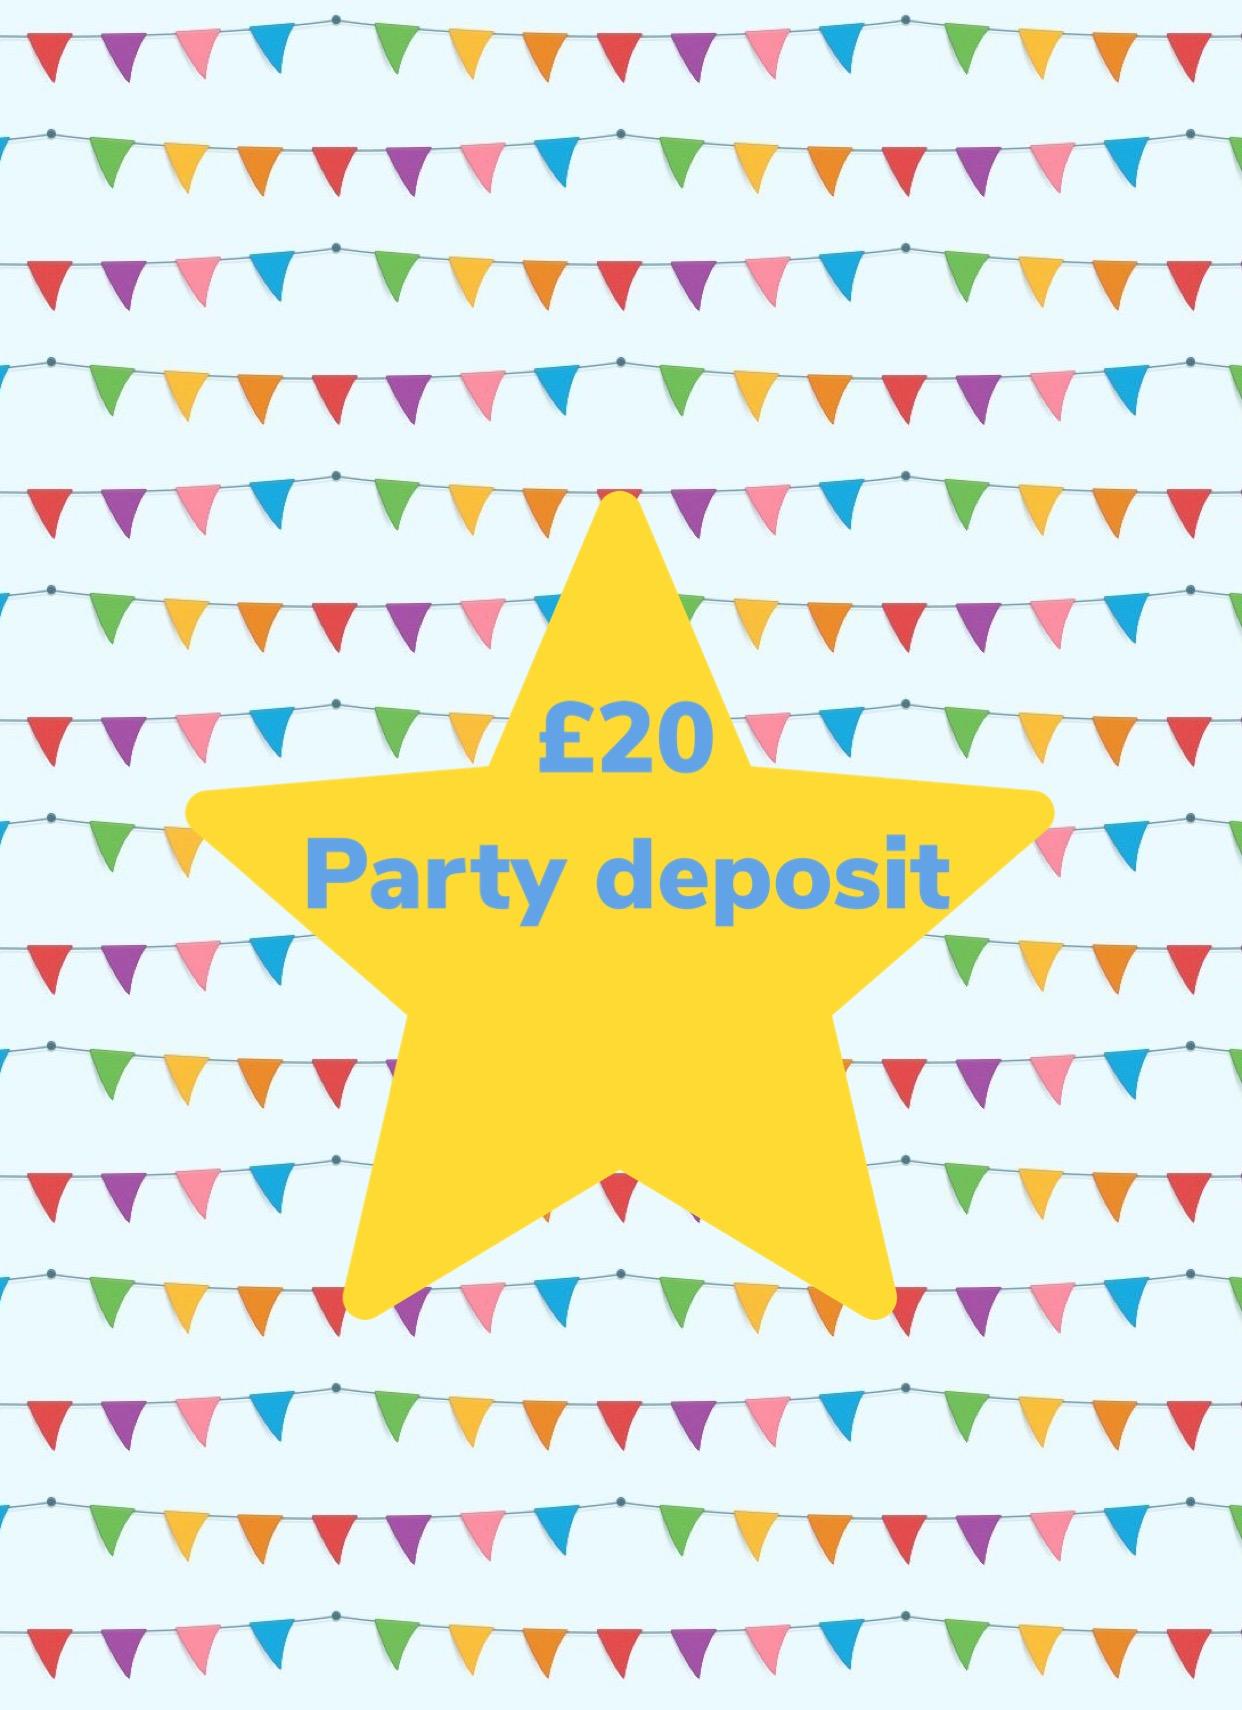 £20 party deposit